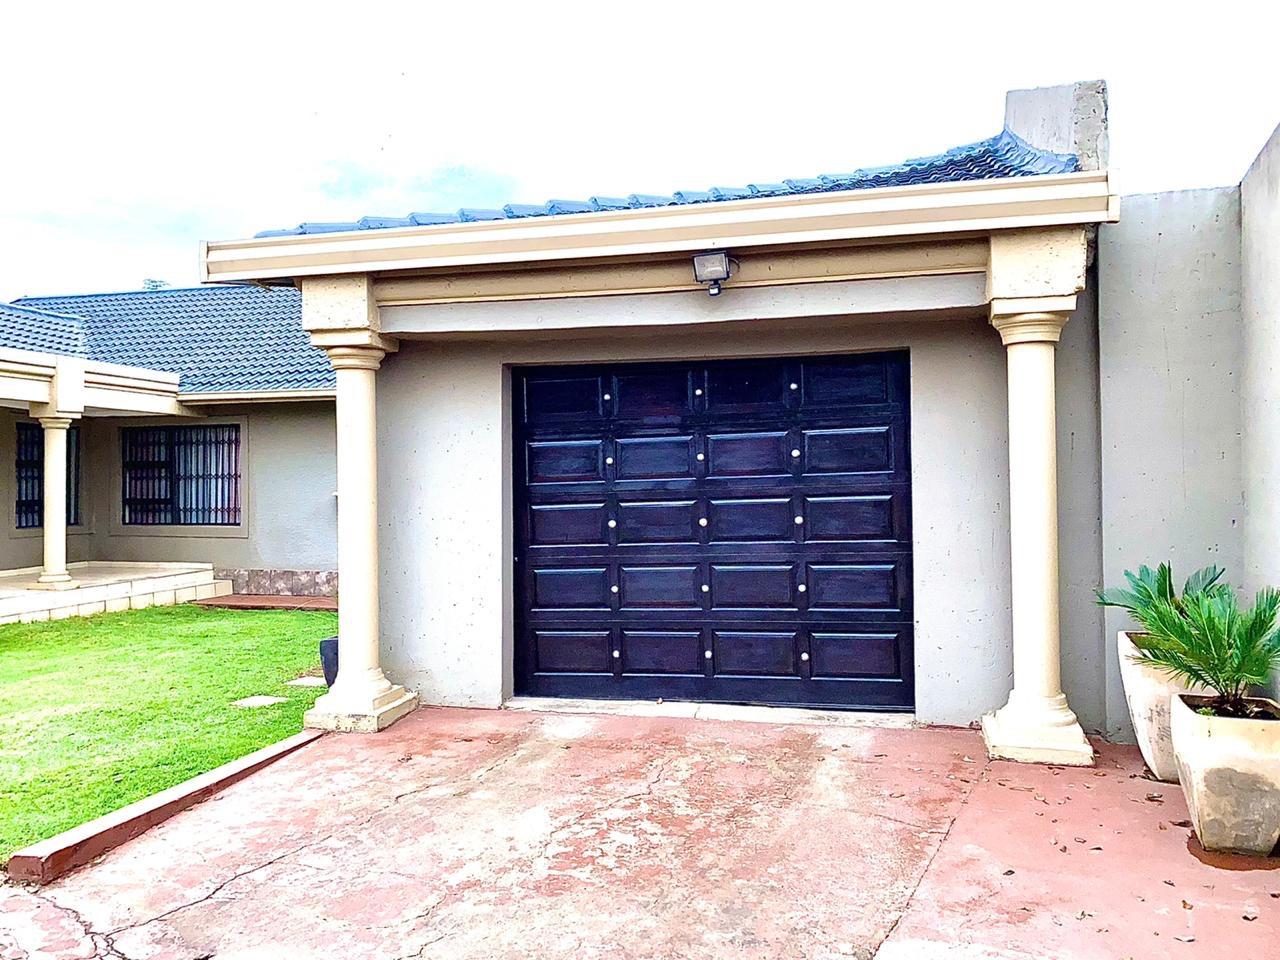 4 Bedroom House For Sale in Groeneweide